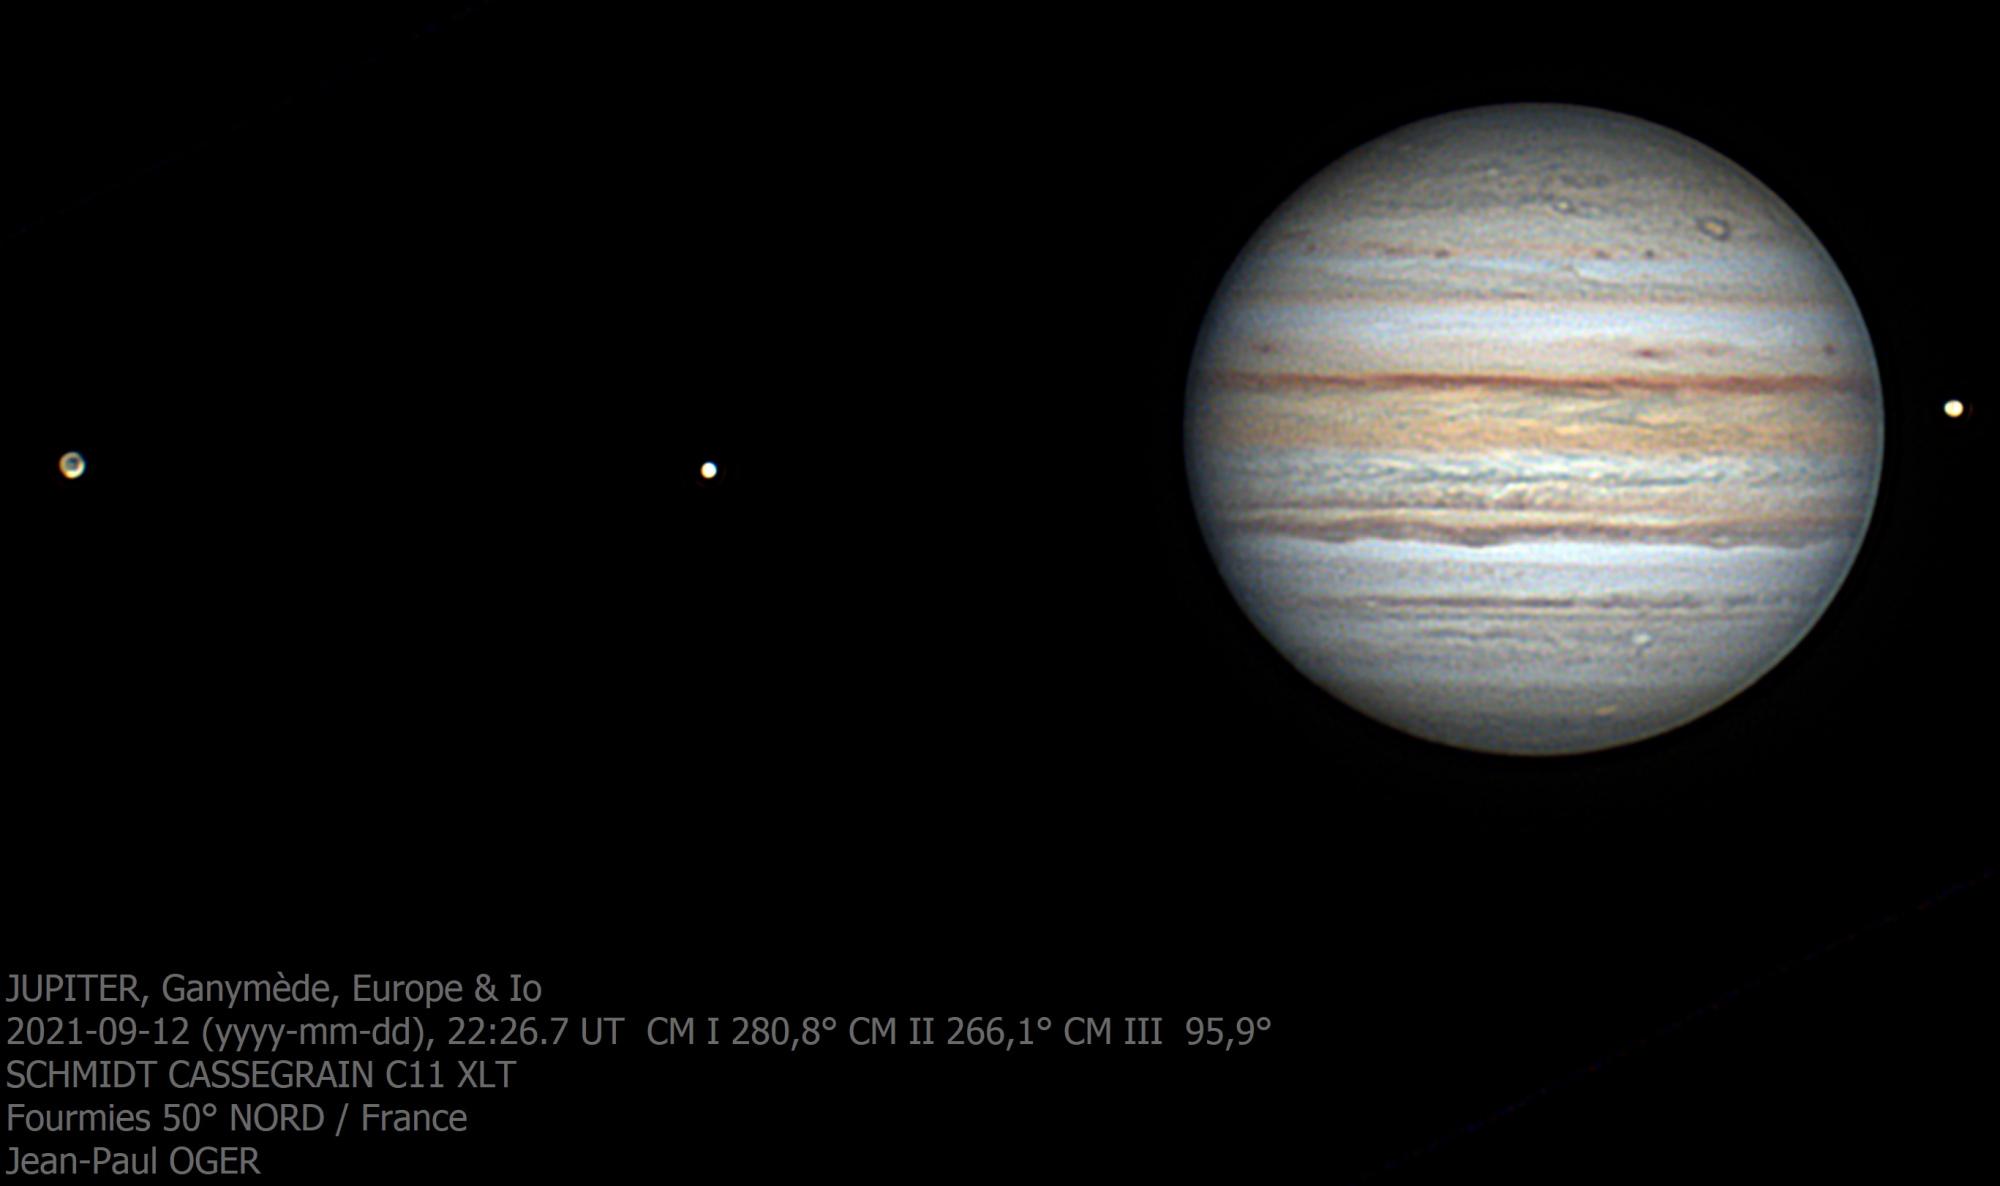 2021-09-12-2226_7-Jupiter_lapl5_ap492_conv b.jpg